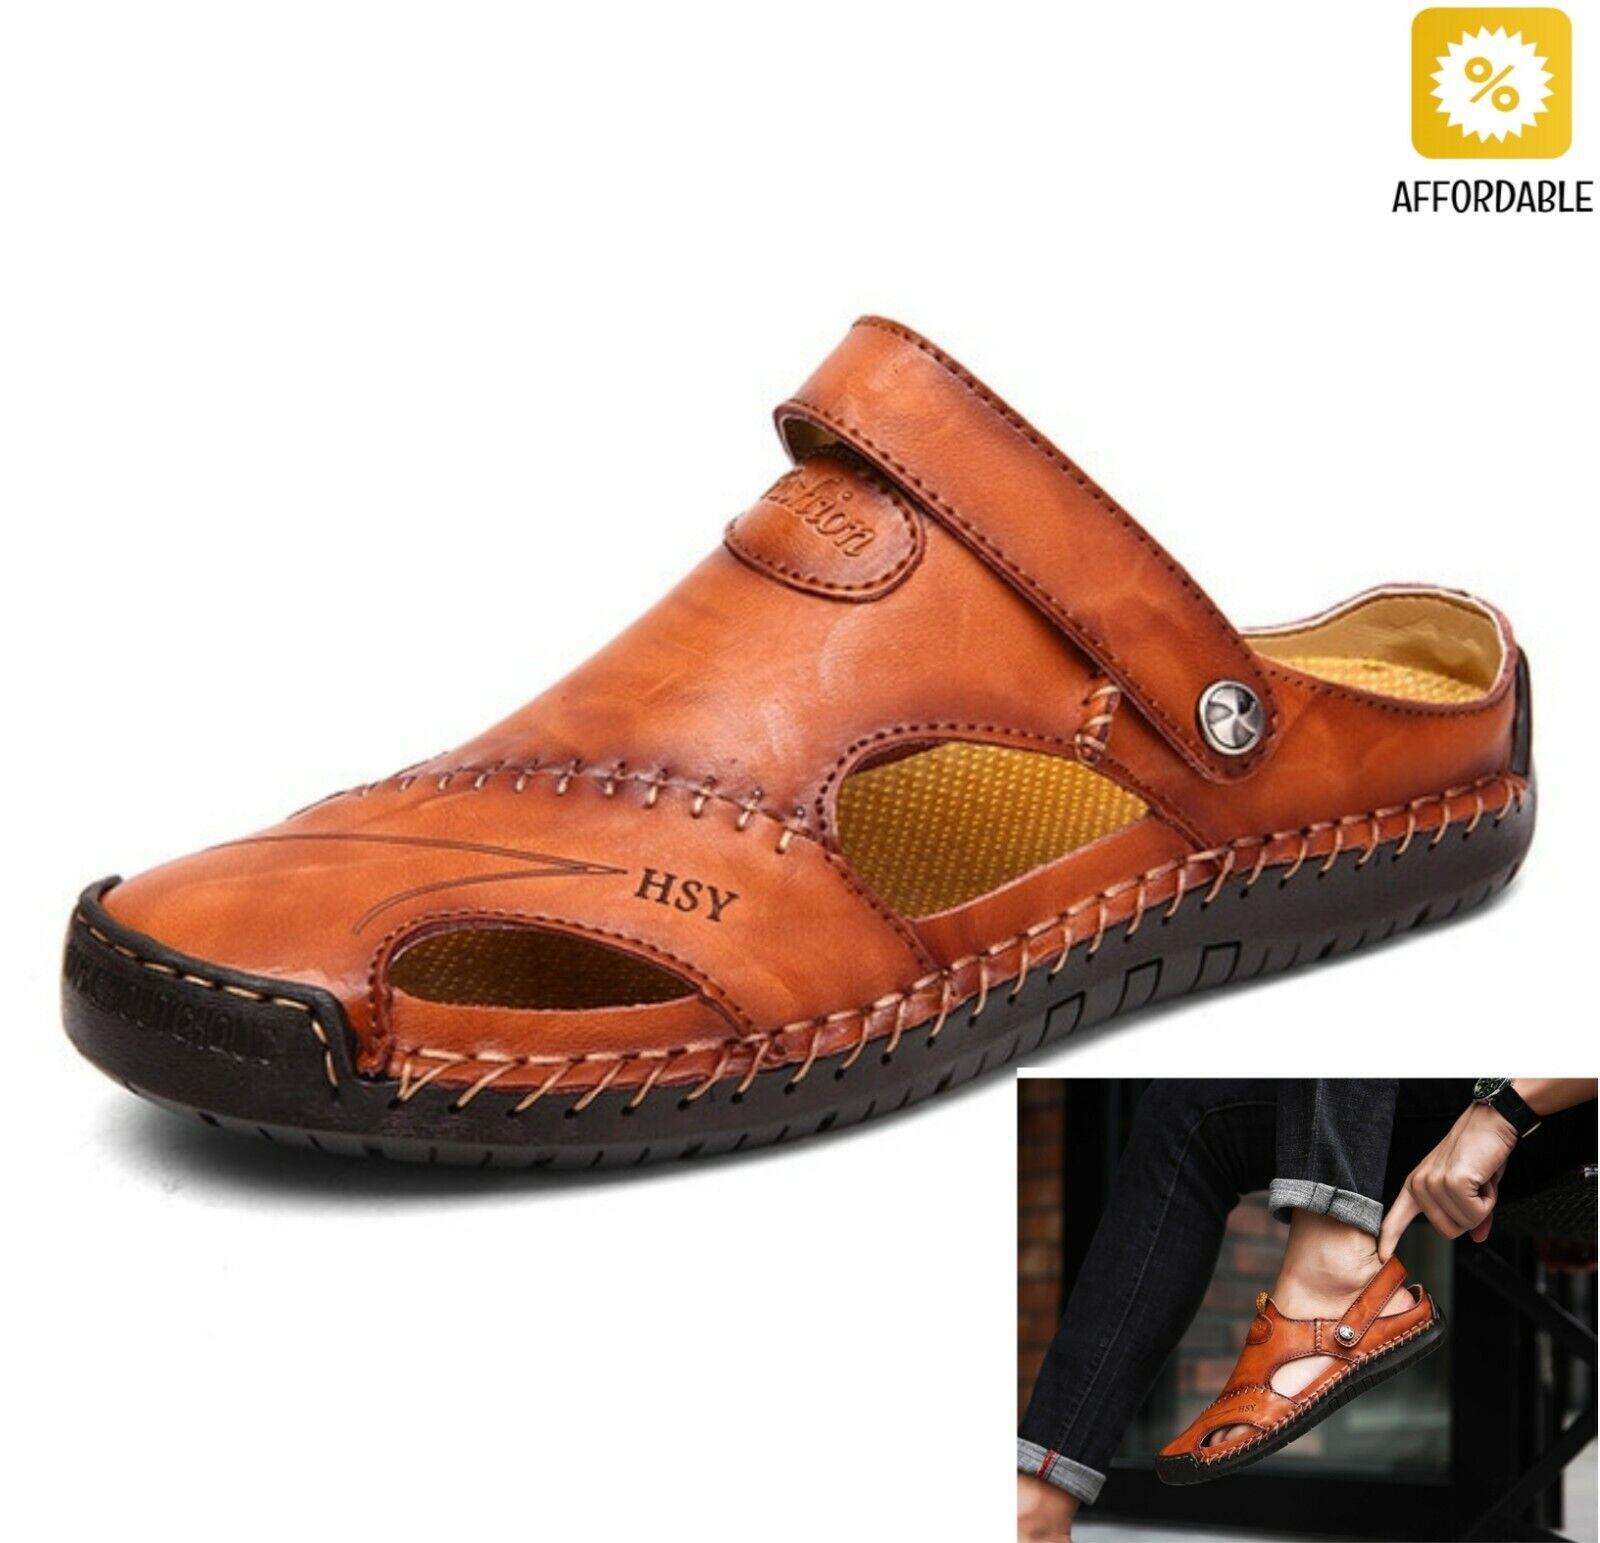 Sandal Men Leather Classic Roman Sandal Slipper Outdoor Sneaker Rubber Flip Flop